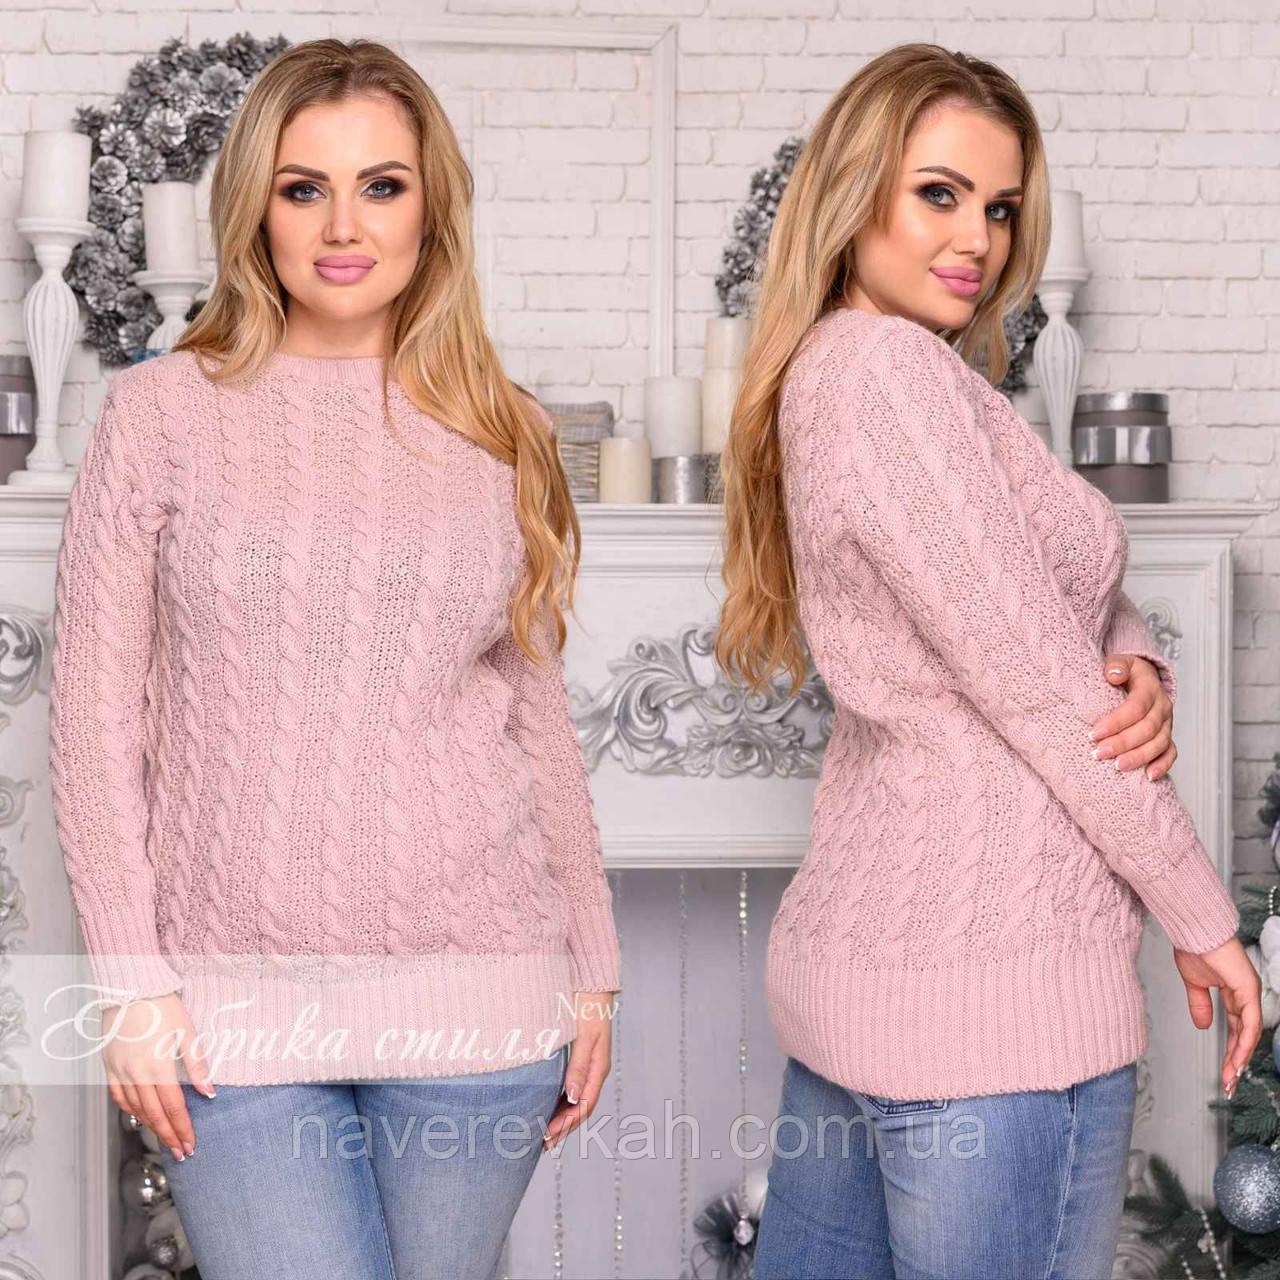 Женский зимний теплый свитер вязка серый пудра темно-синий 48-52